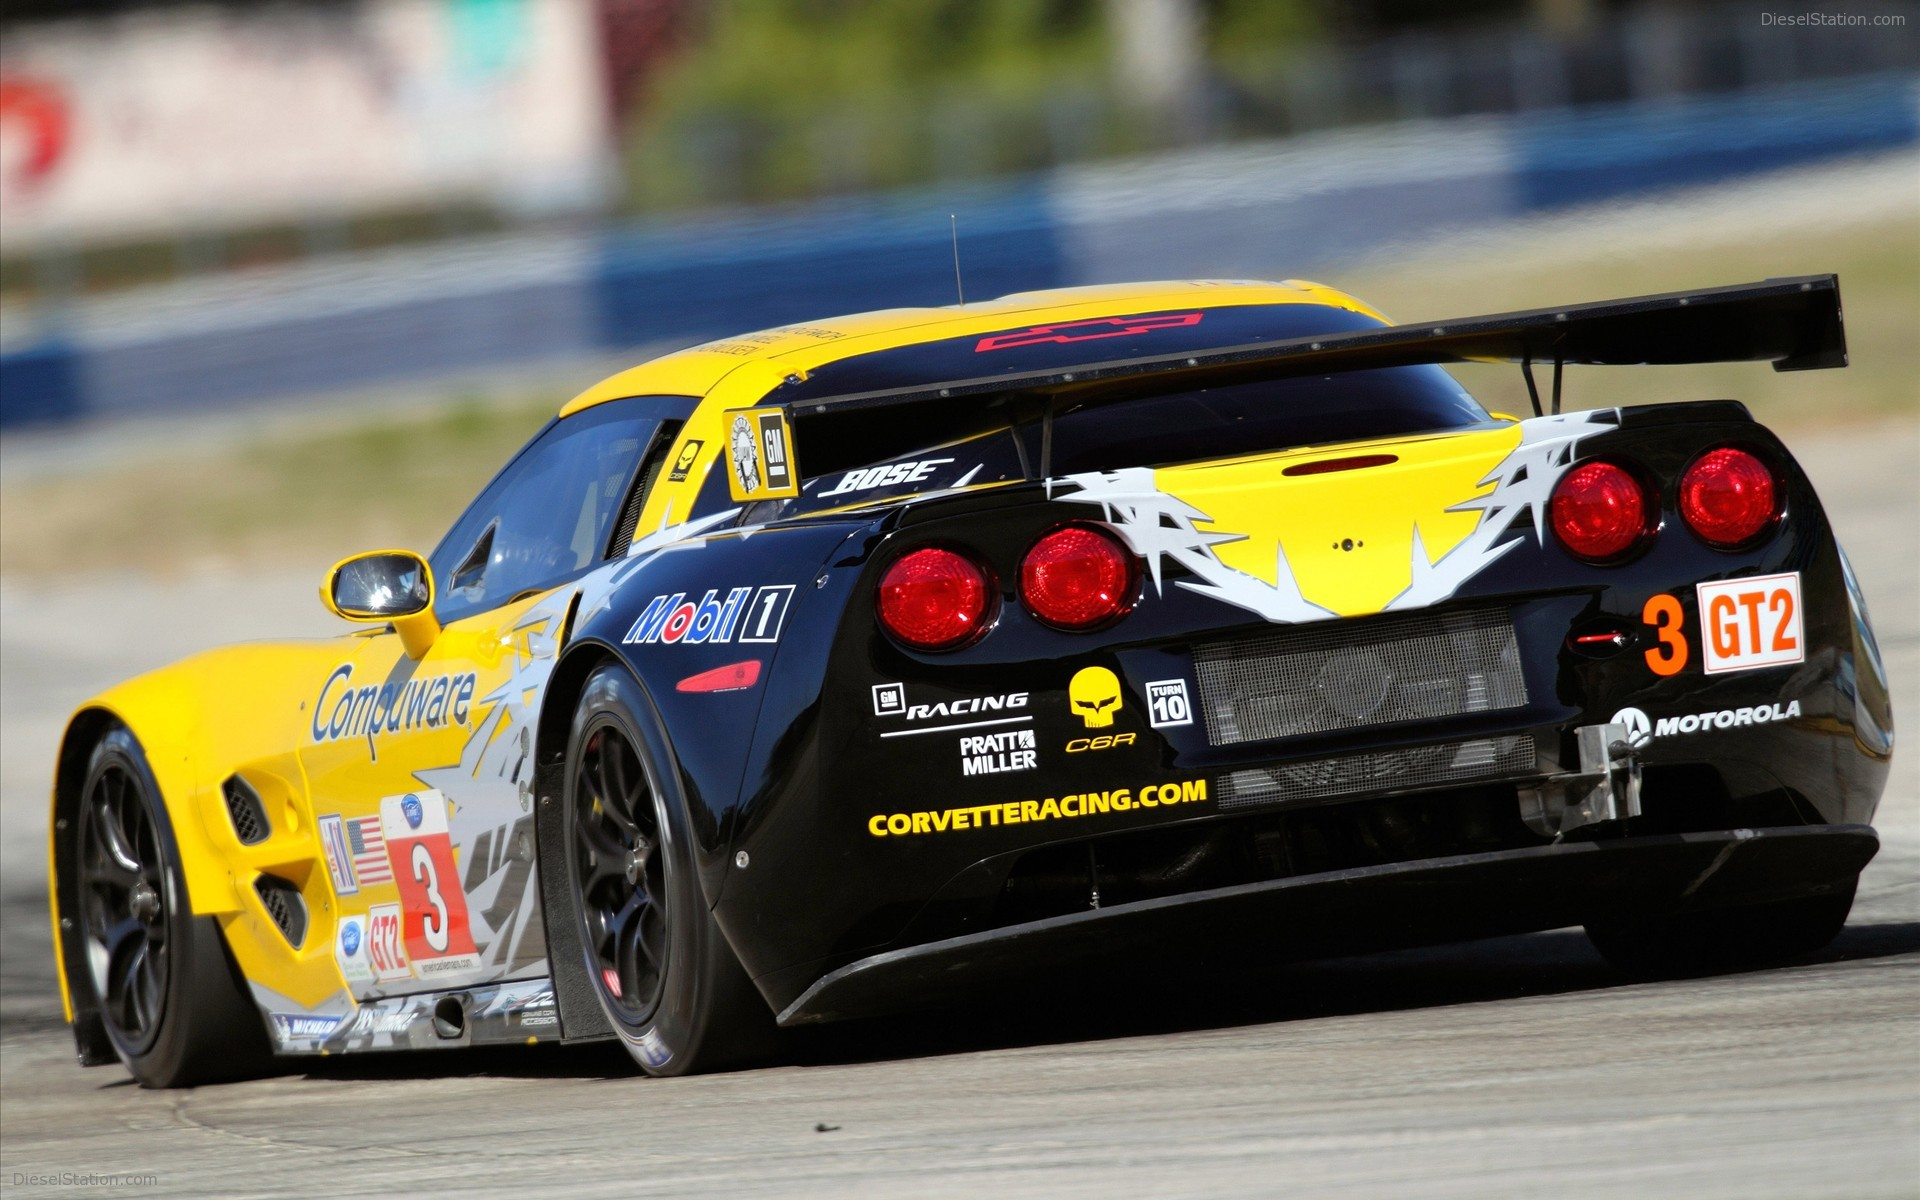 Corvette Sebring Racing 2010 Widescreen Exotic Car Wallpapers 08 of 1920x1200